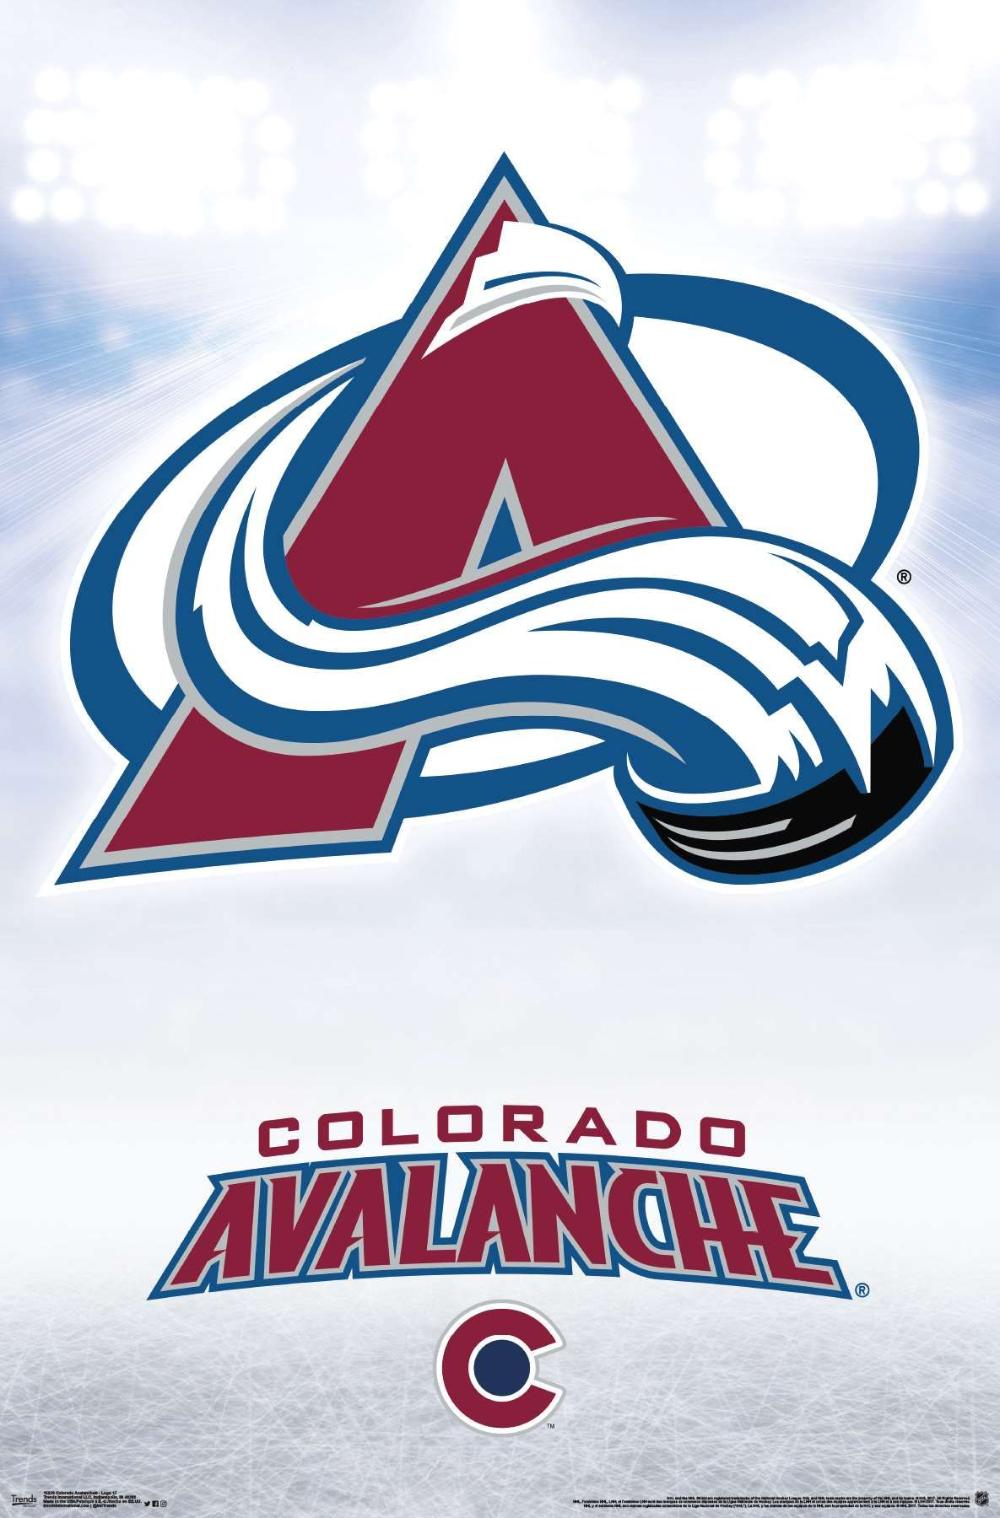 Nhl Colorado Avalanche Logo Colorado Avalanche Logo Colorado Avalanche Colorado Avalanche Hockey